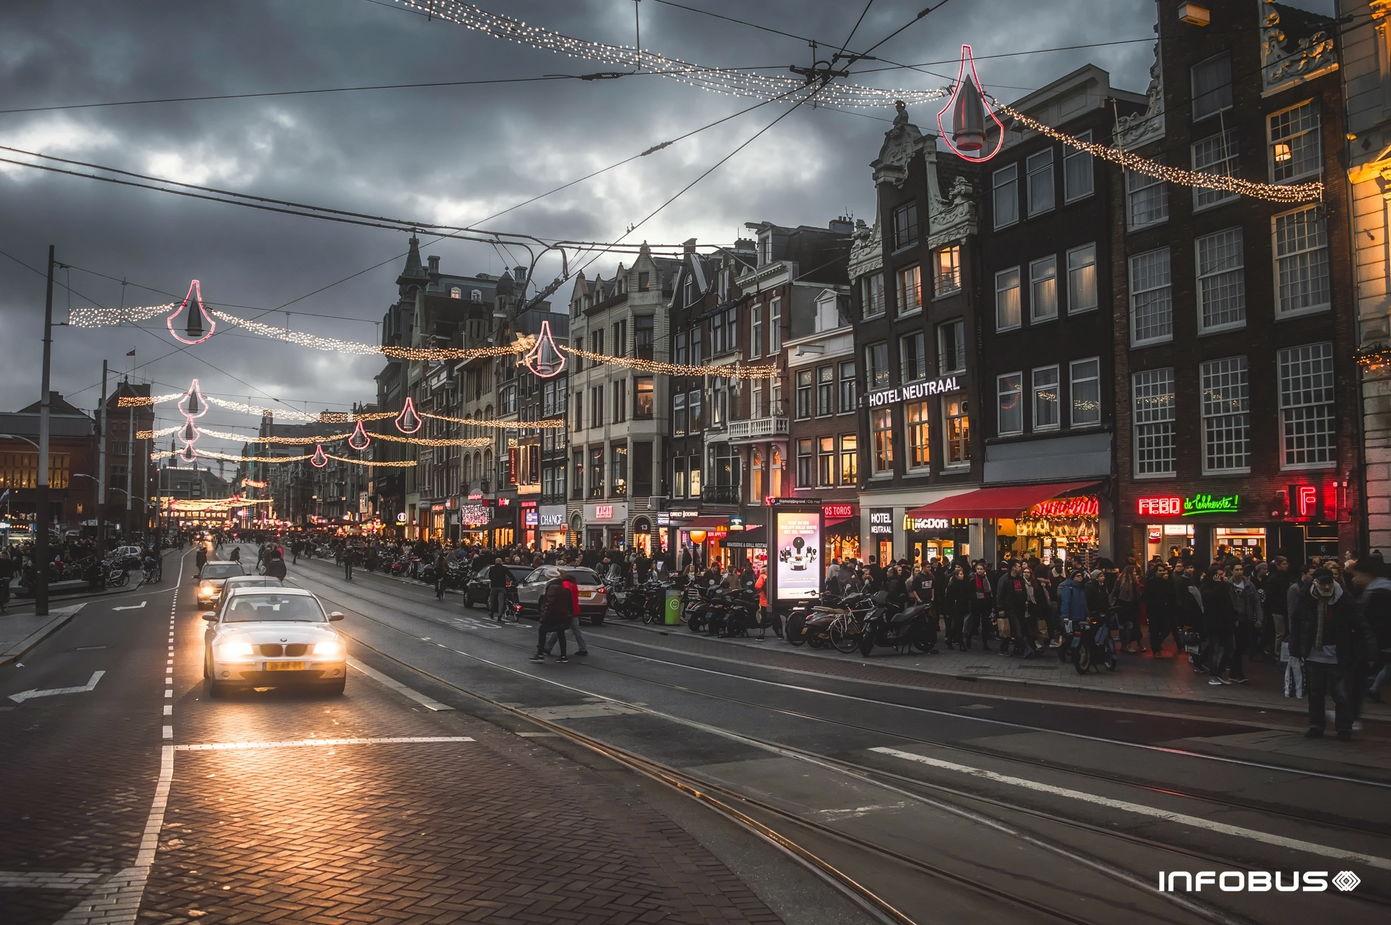 amsterdam-1956330